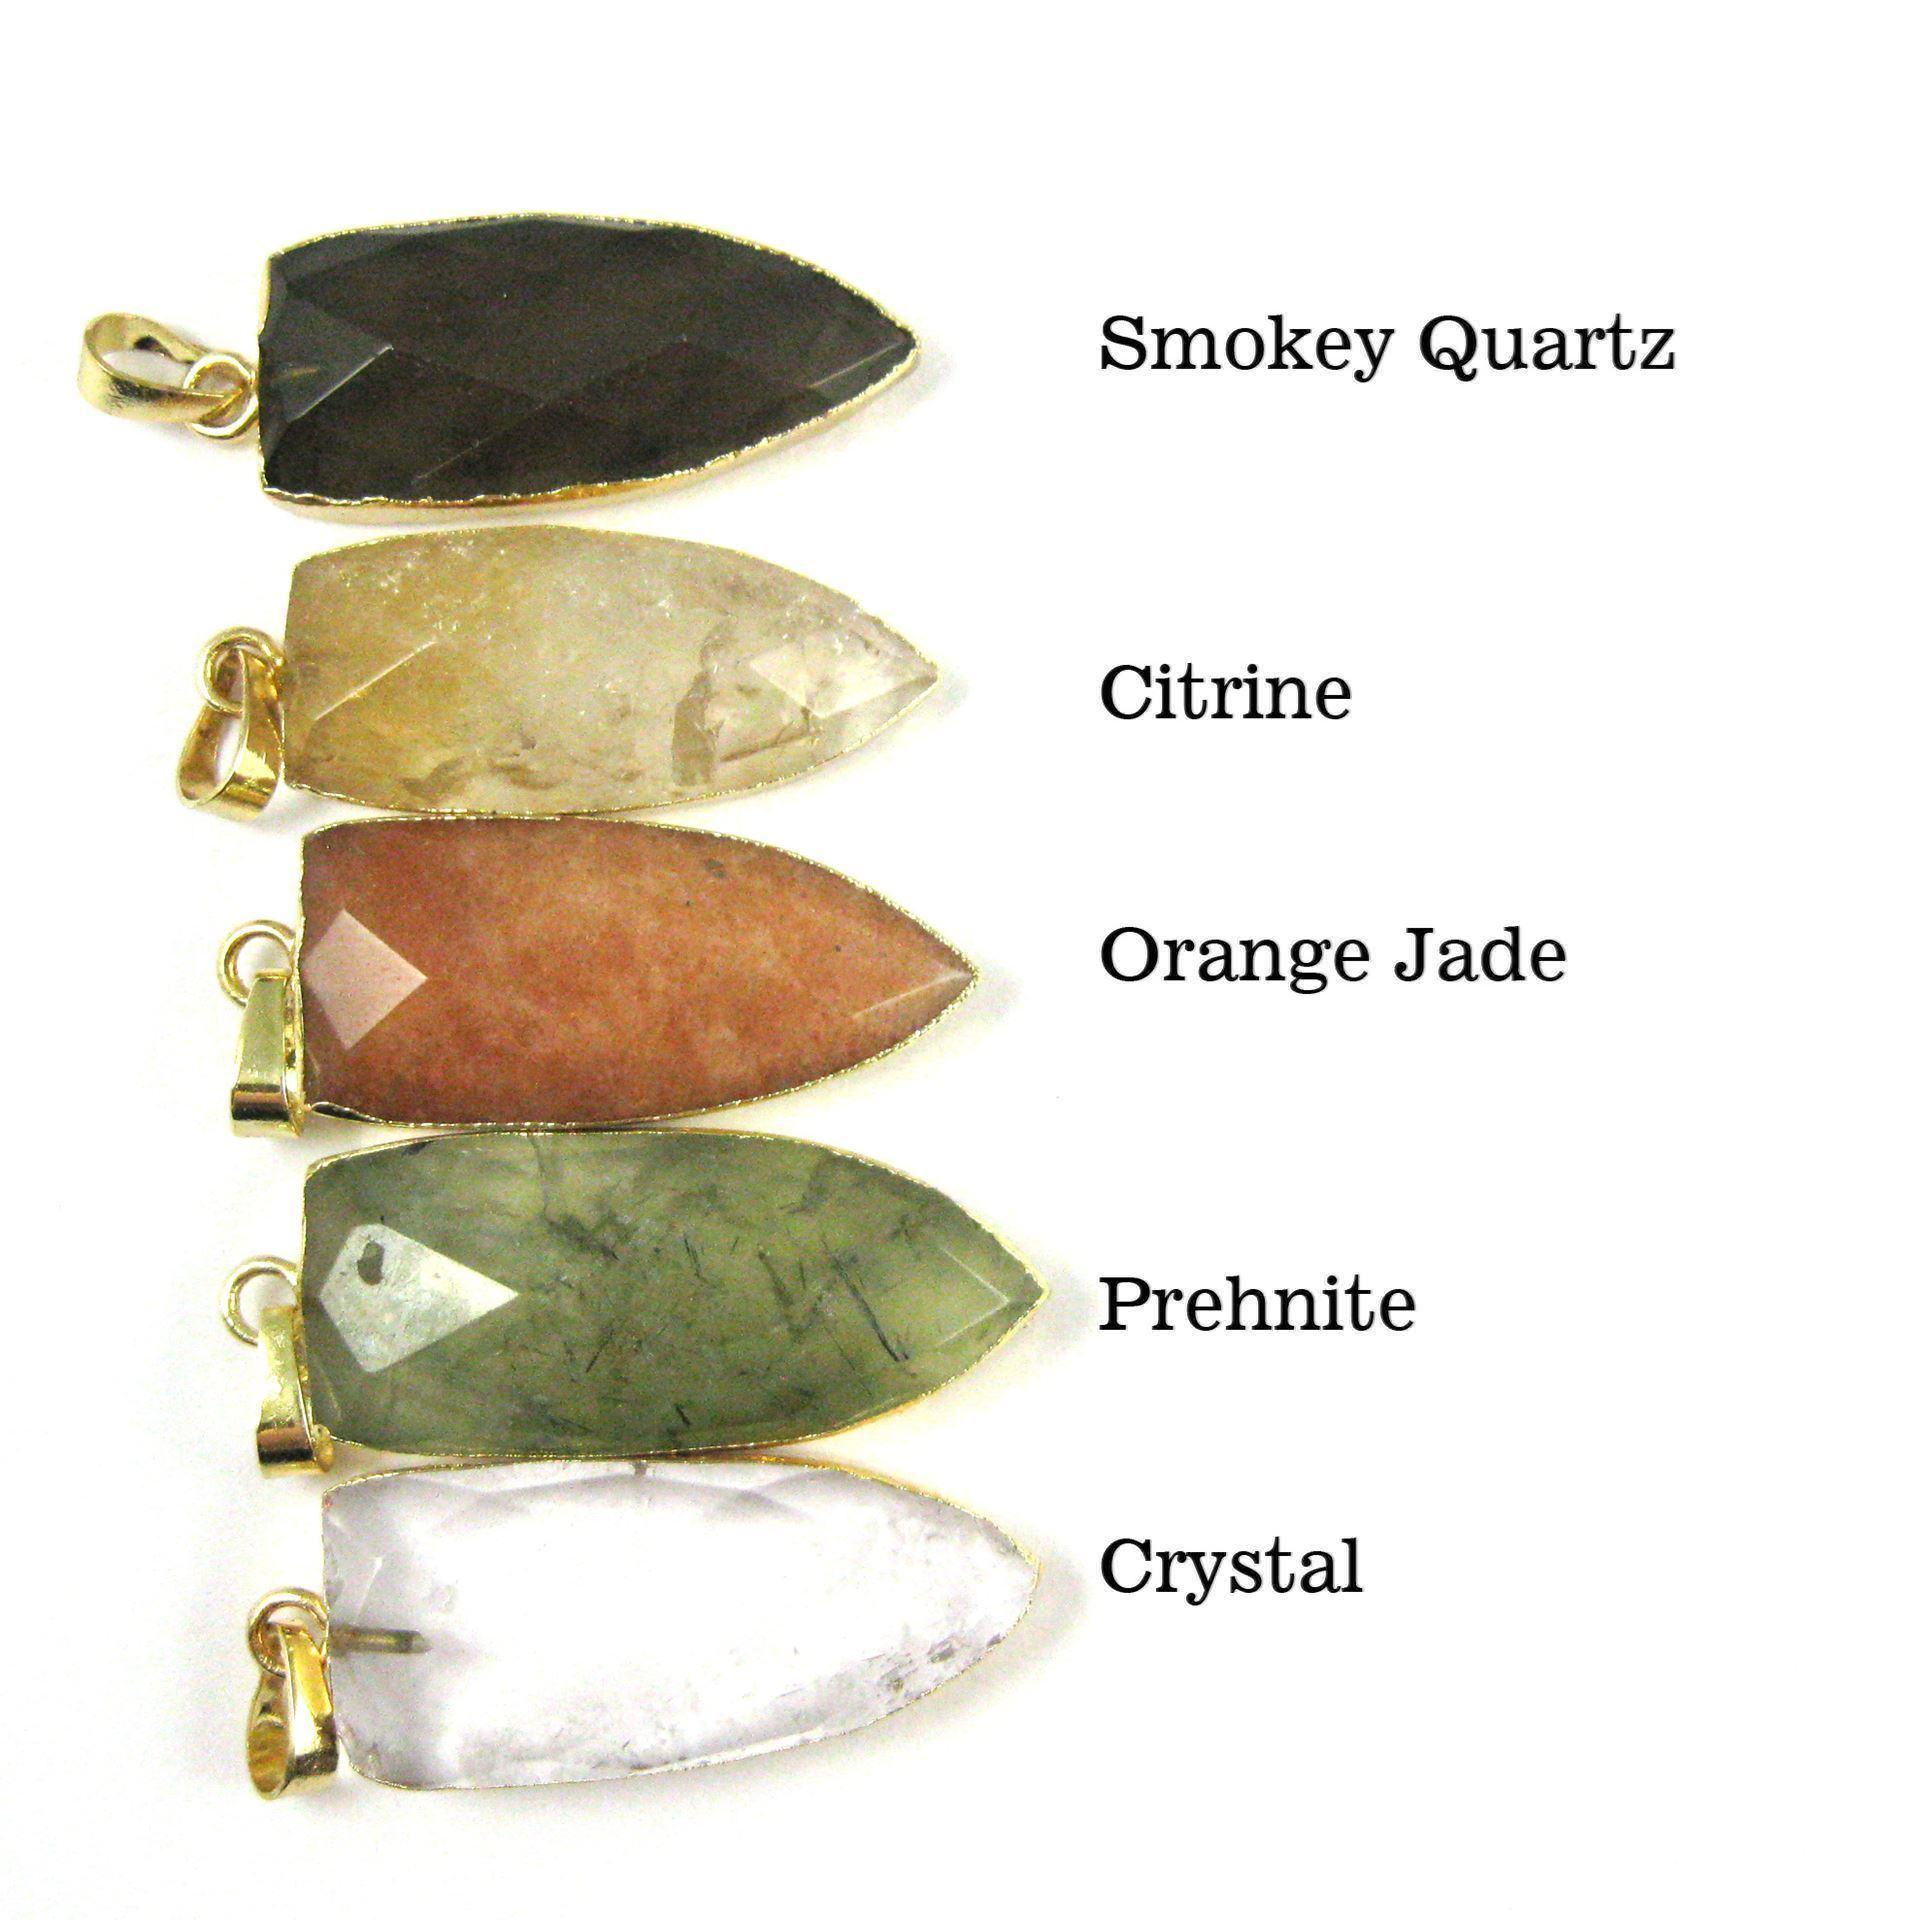 Gold Plated Faceted Arrowhead Pendant-Arrowhead charm-Natural Gemstone Spike Pendant - Lemon Quartz - 40mm